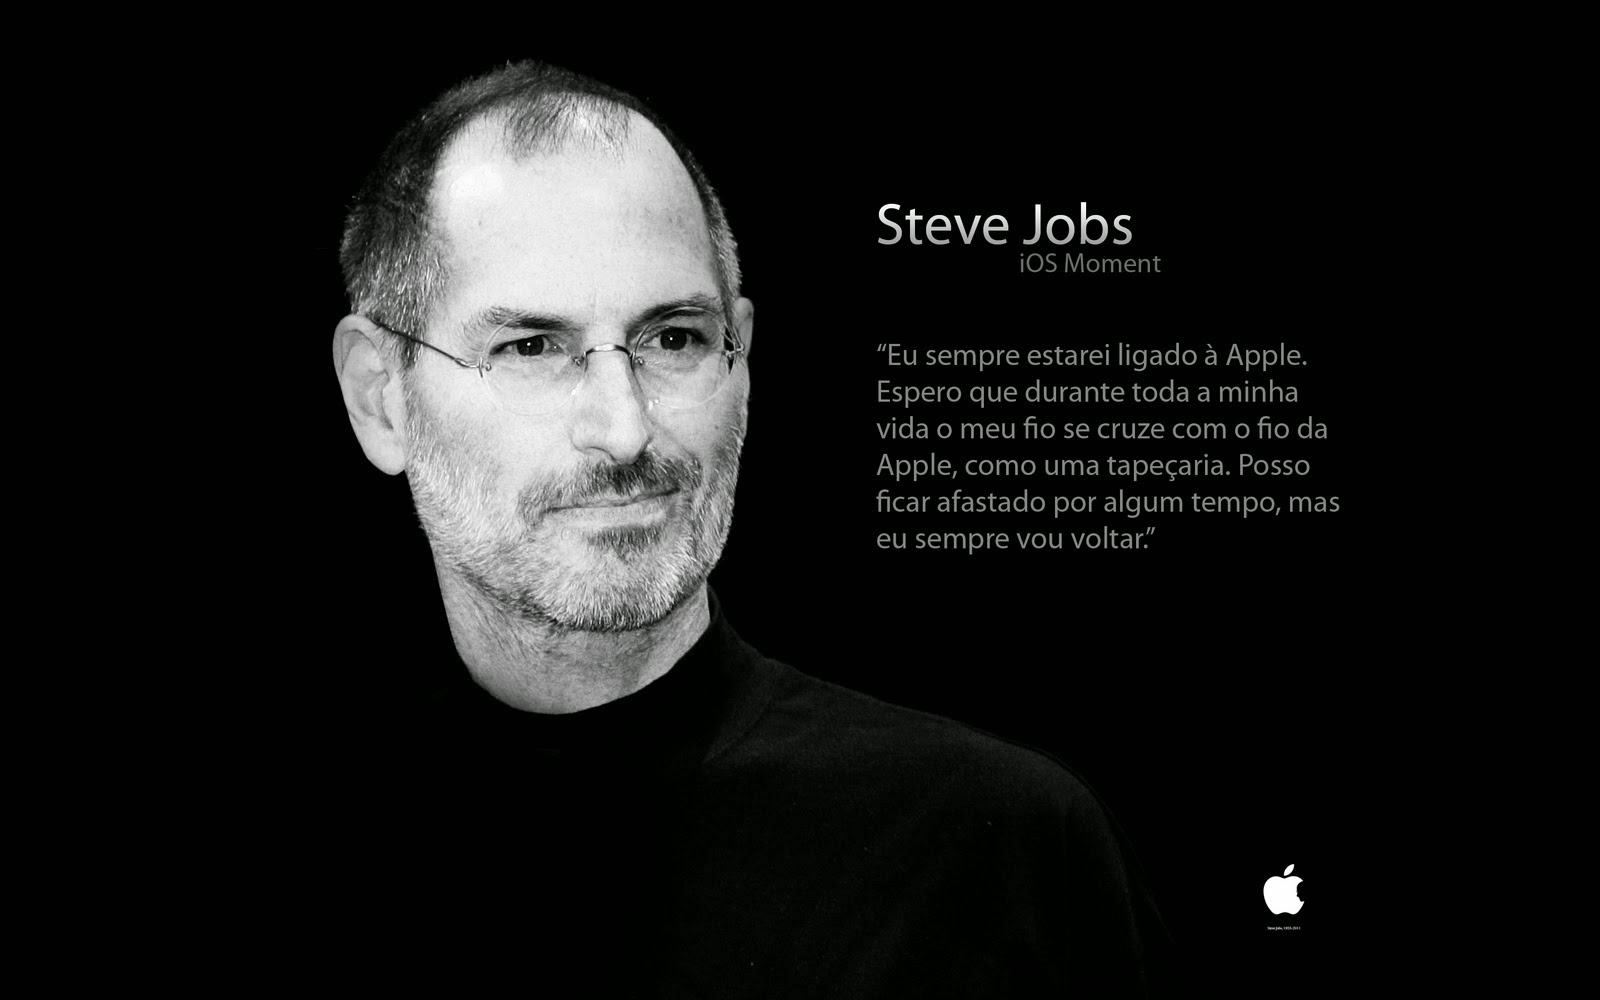 Portal da Língua Inglesa: 10 Timeless Marketing Lessons Steve Jobs Taught Us